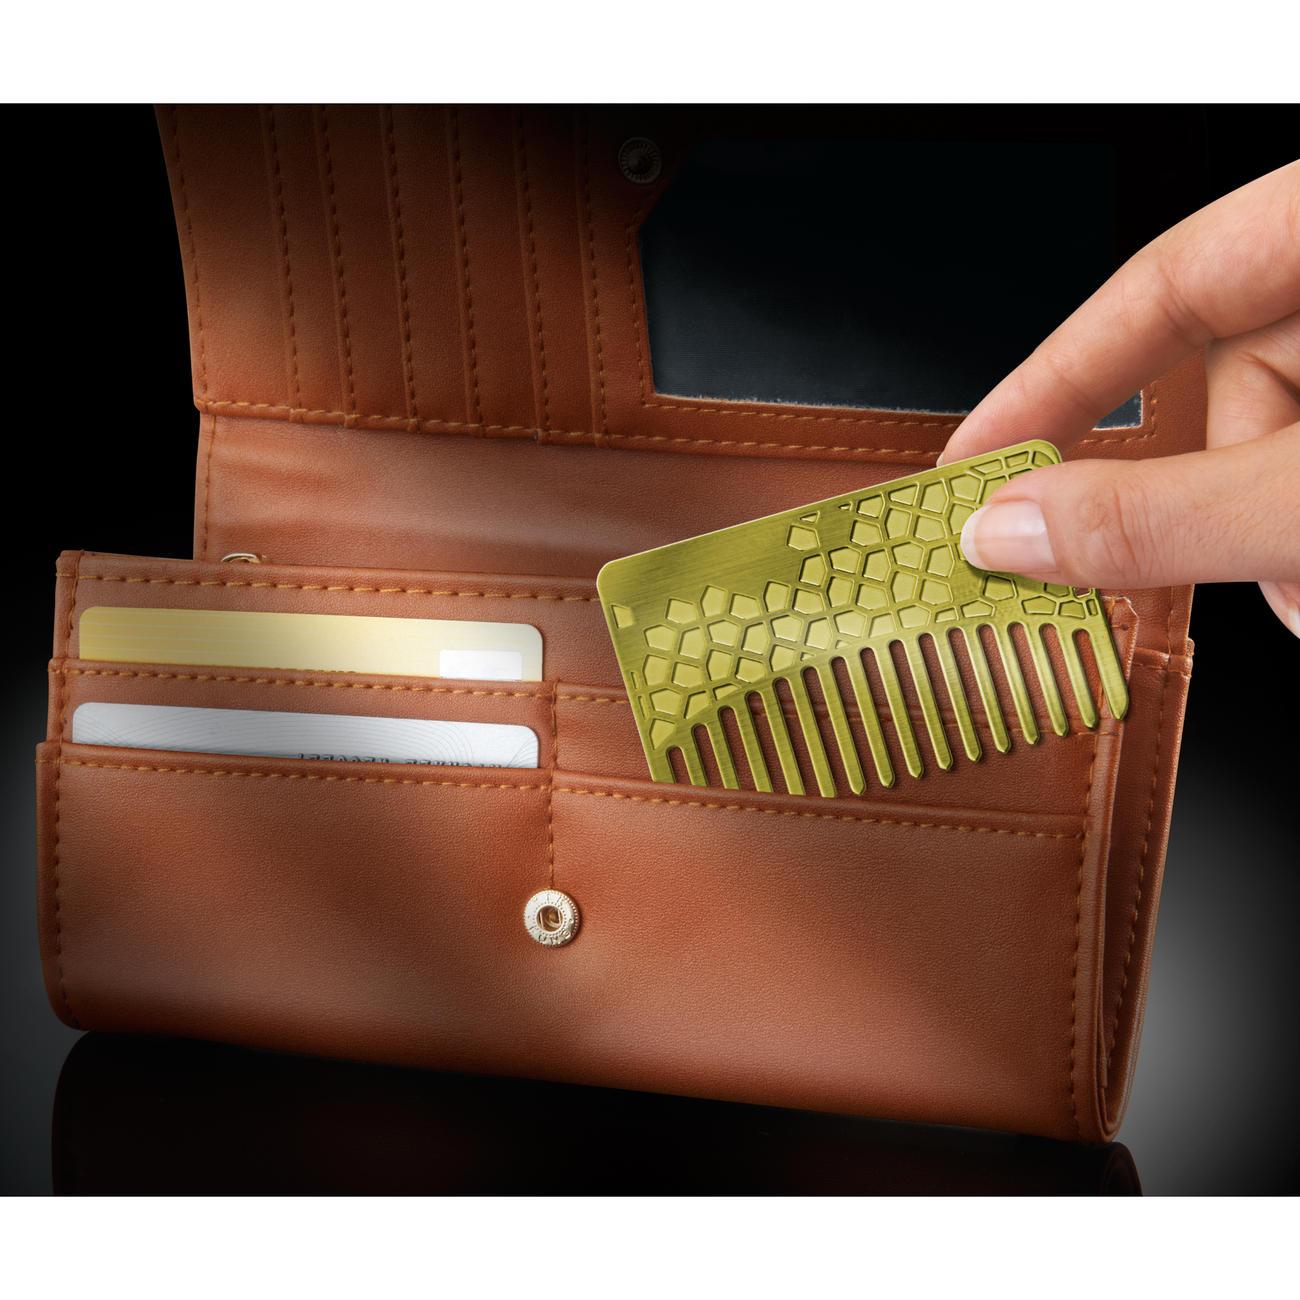 Brieftaschen-Kamm Messing oder Edelstahl, Messing